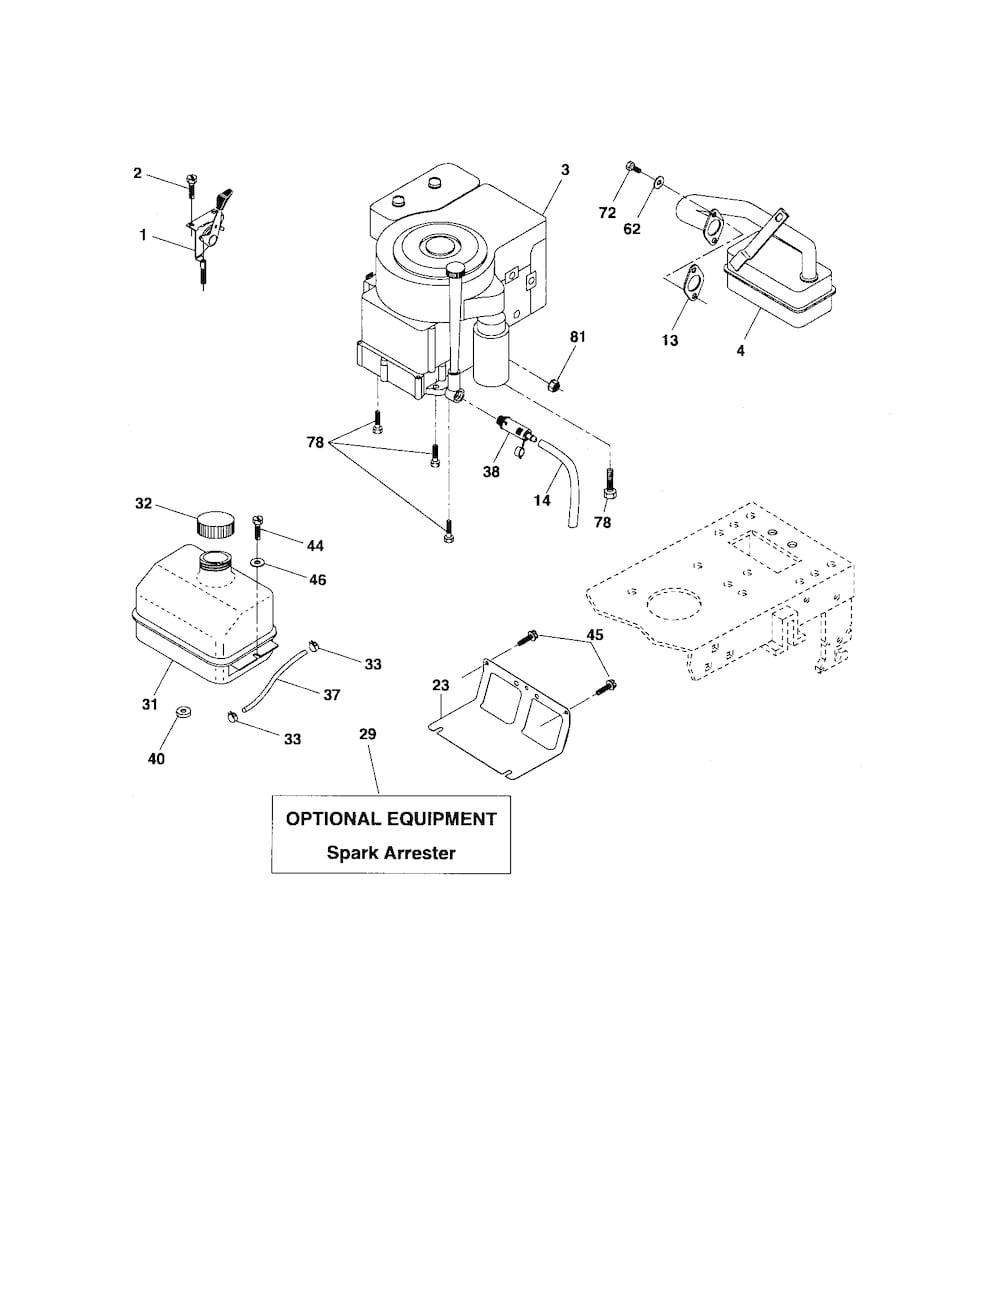 Poulan Tractor model # PB1638LT